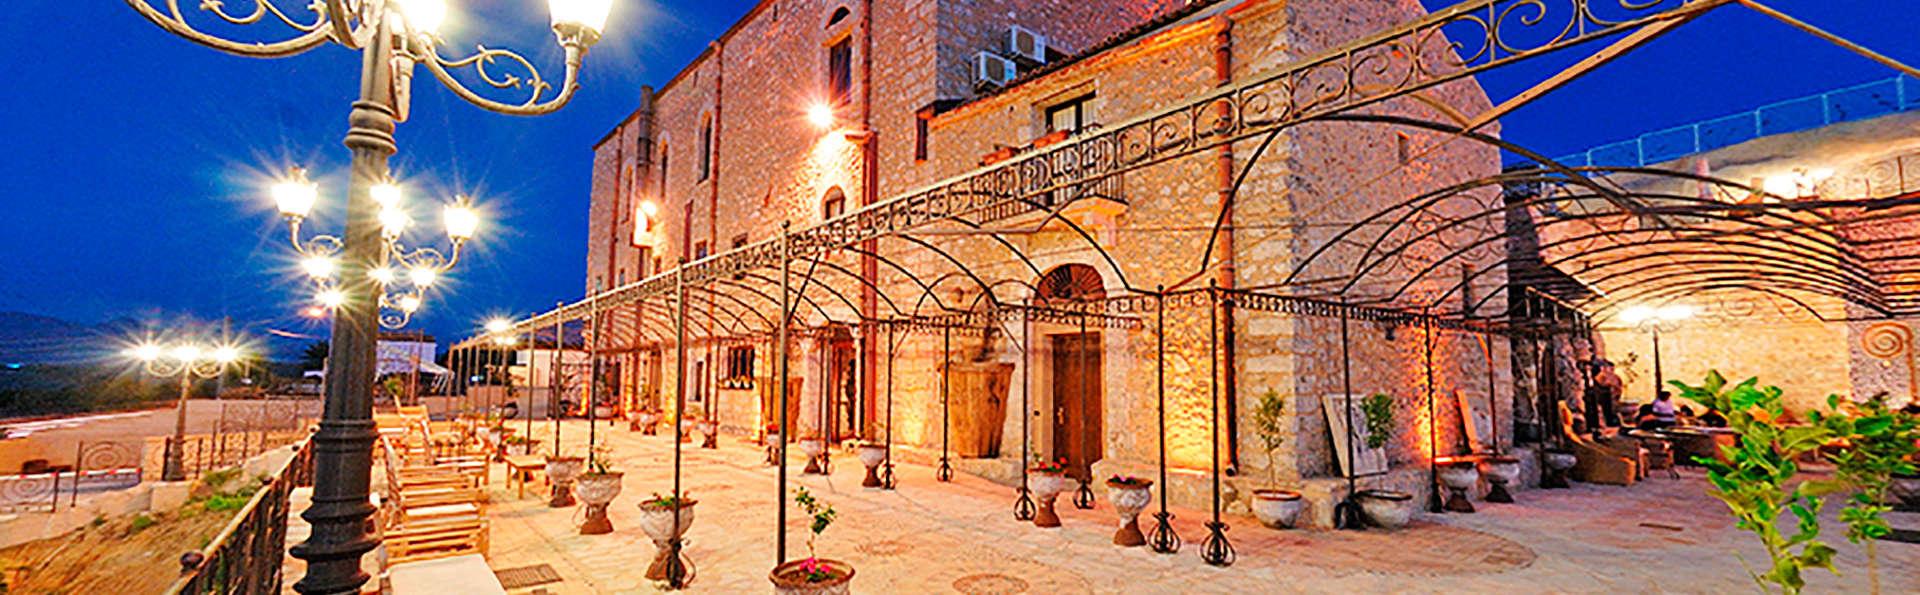 Grand Hotel La Batia - edit_ingresso_big.jpg